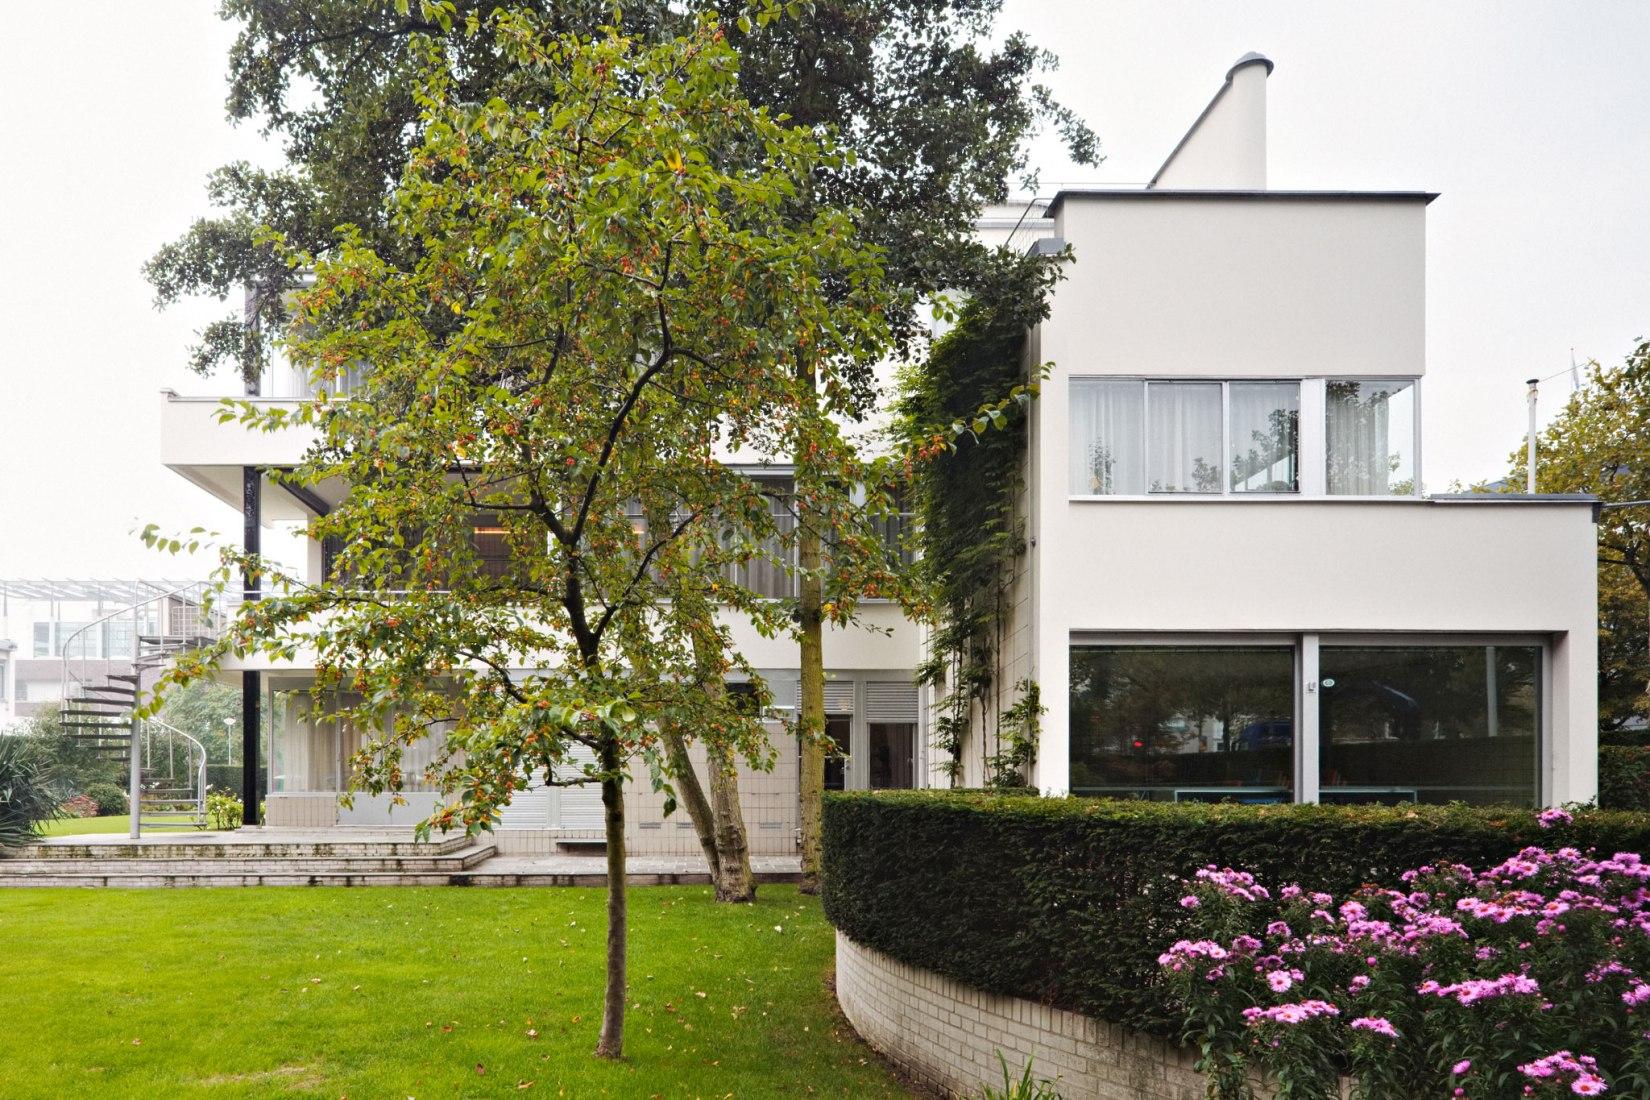 Sonneveld House by Brinkman & Van der Vlugt. Photograph by Johannes Schwartz.